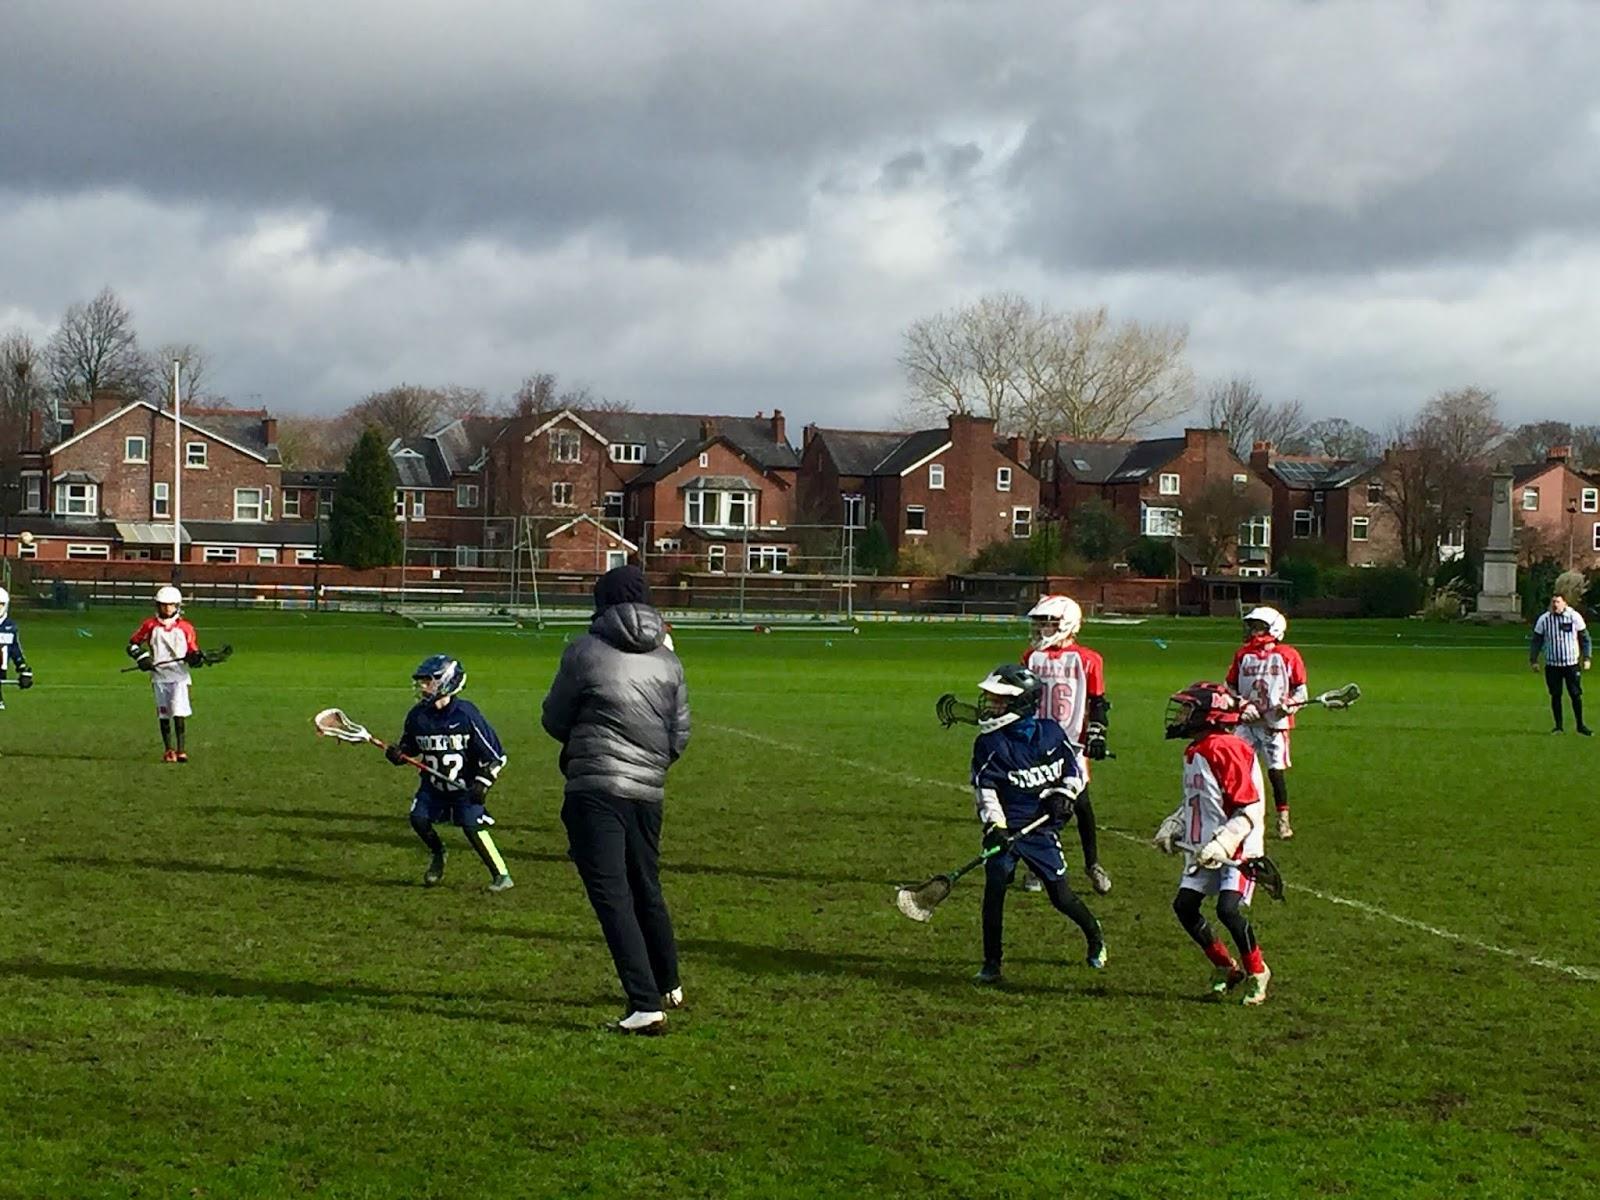 Stockport Lacrosse Club Juniors: U12s Stockport vs Mellor